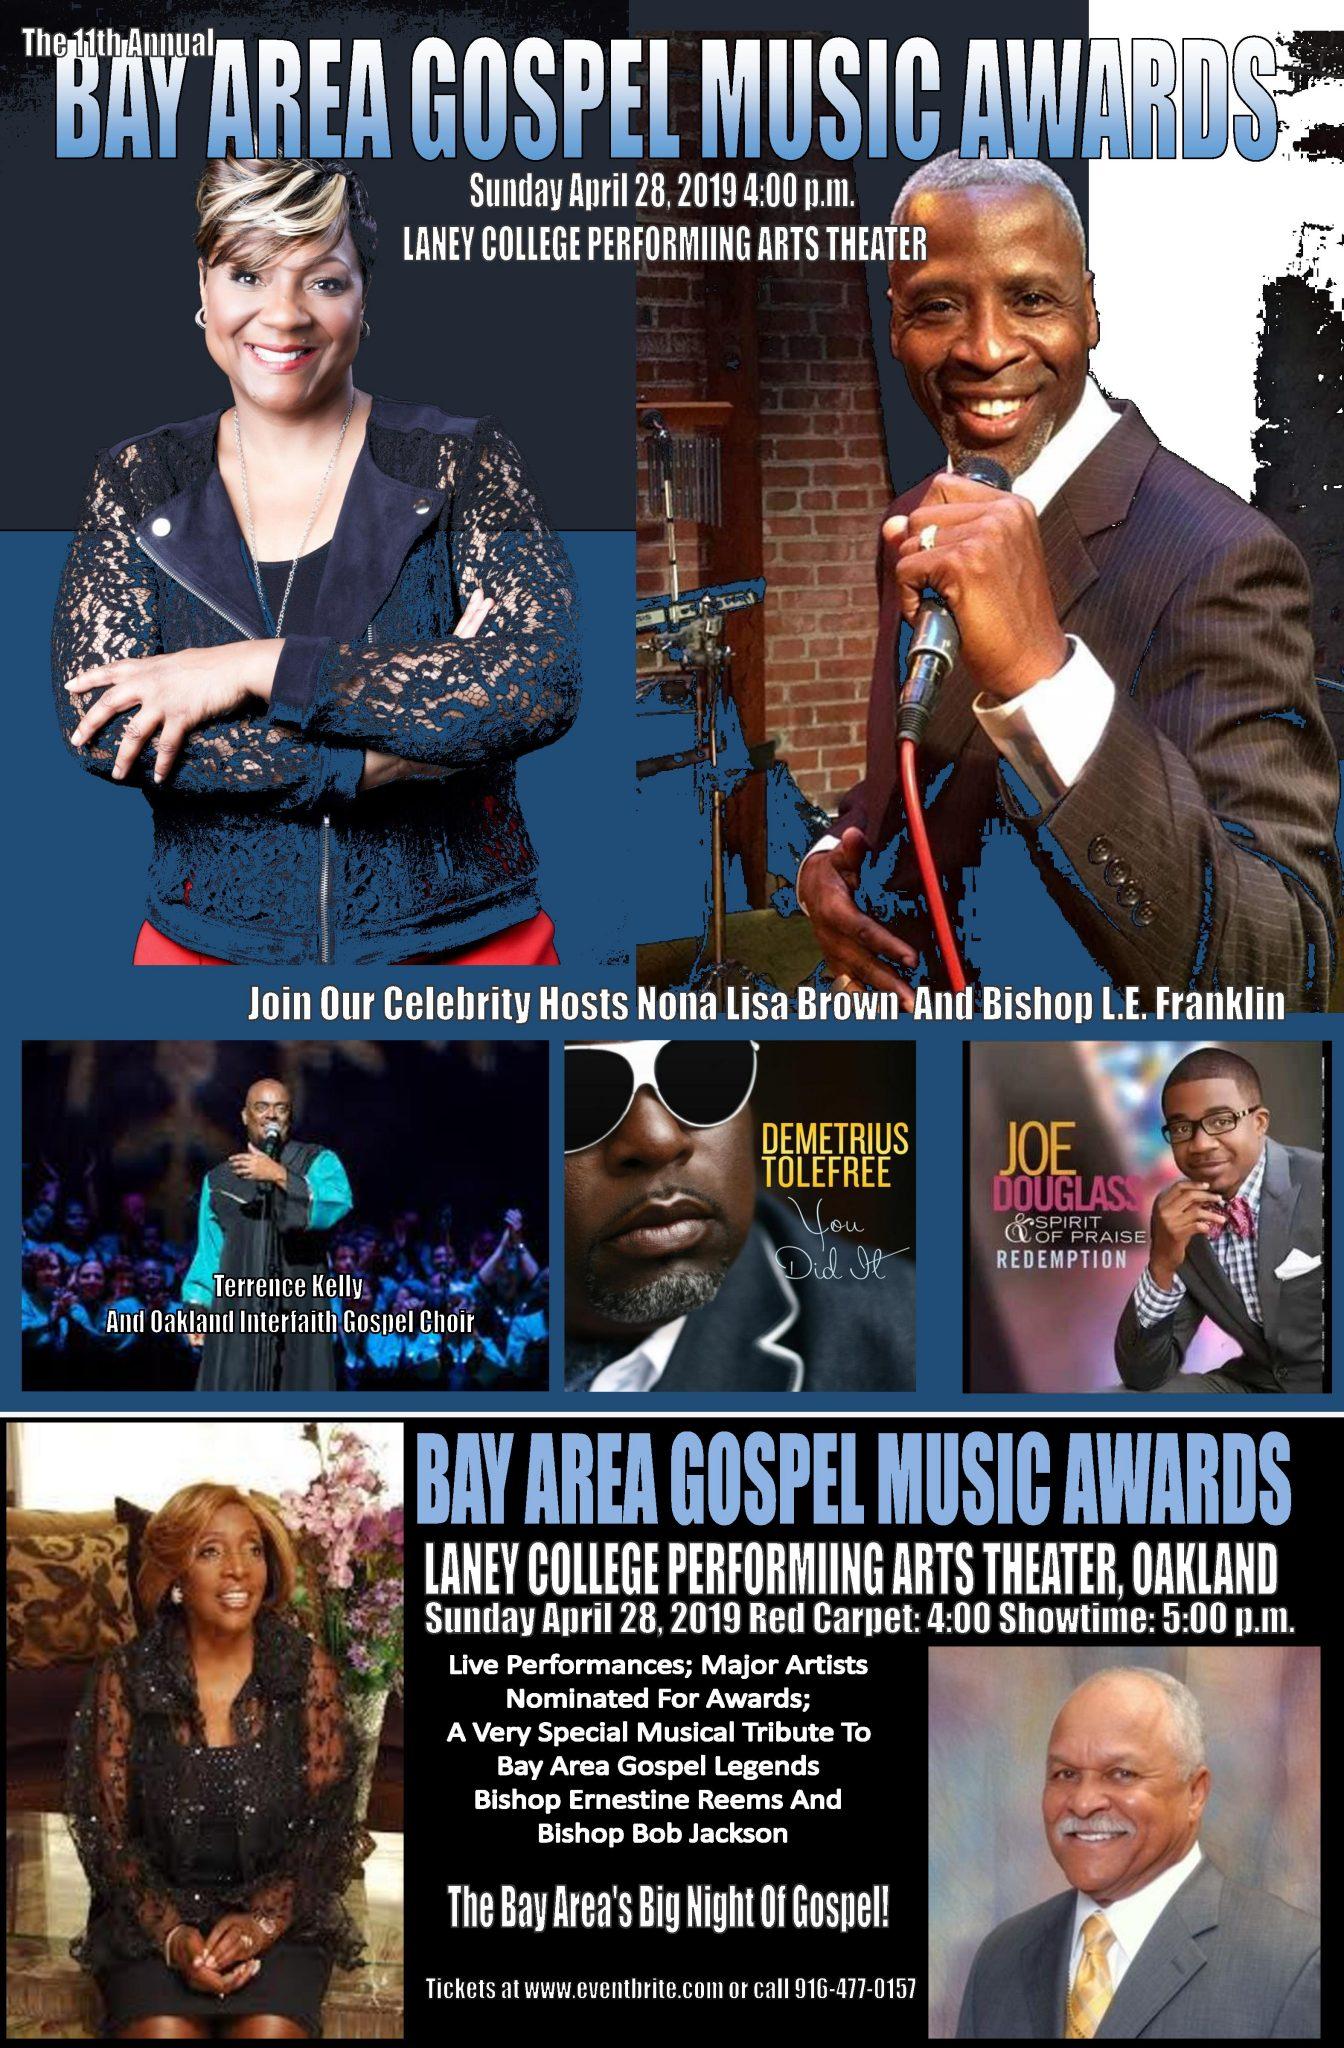 BMA Bay Area Gospel Music Awards 2019